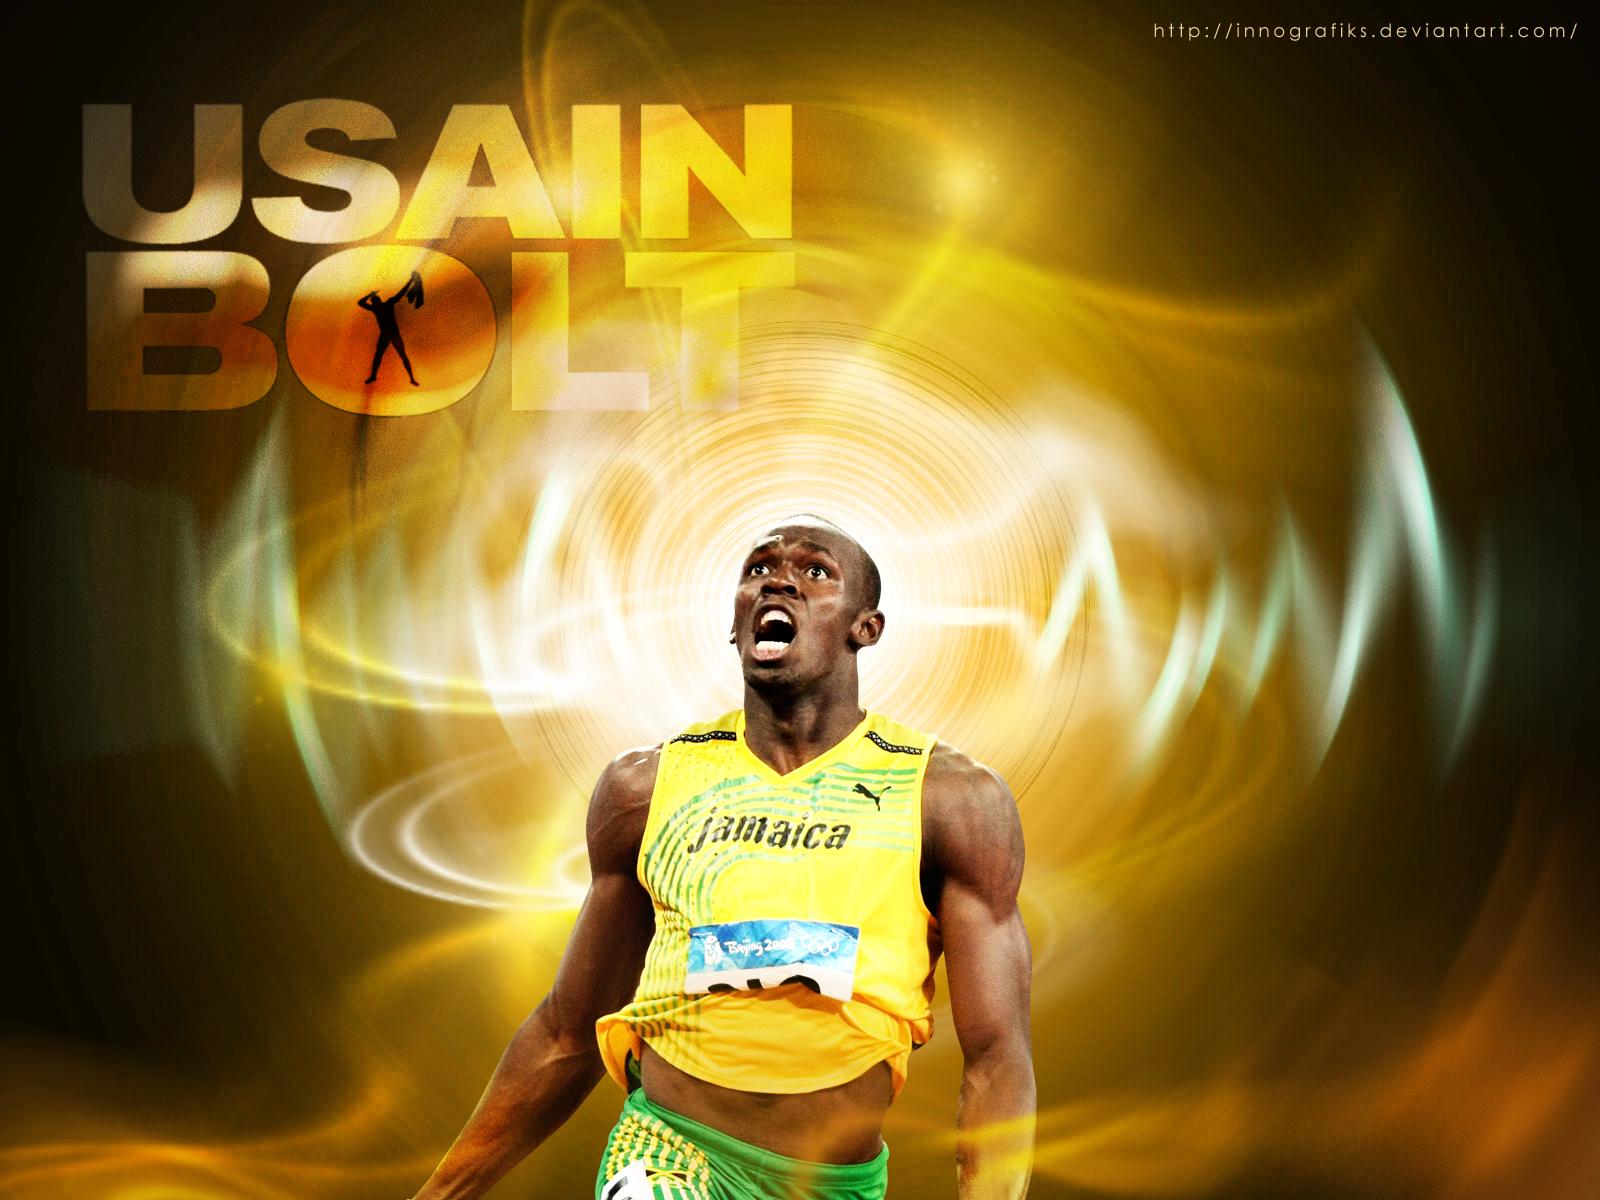 http://1.bp.blogspot.com/-3nG3lQaTulA/UCbaJswXIXI/AAAAAAAAKgs/X1dQdkgrvPc/s1600/Usain_Bolt_Wallpaper_2012+03.jpg